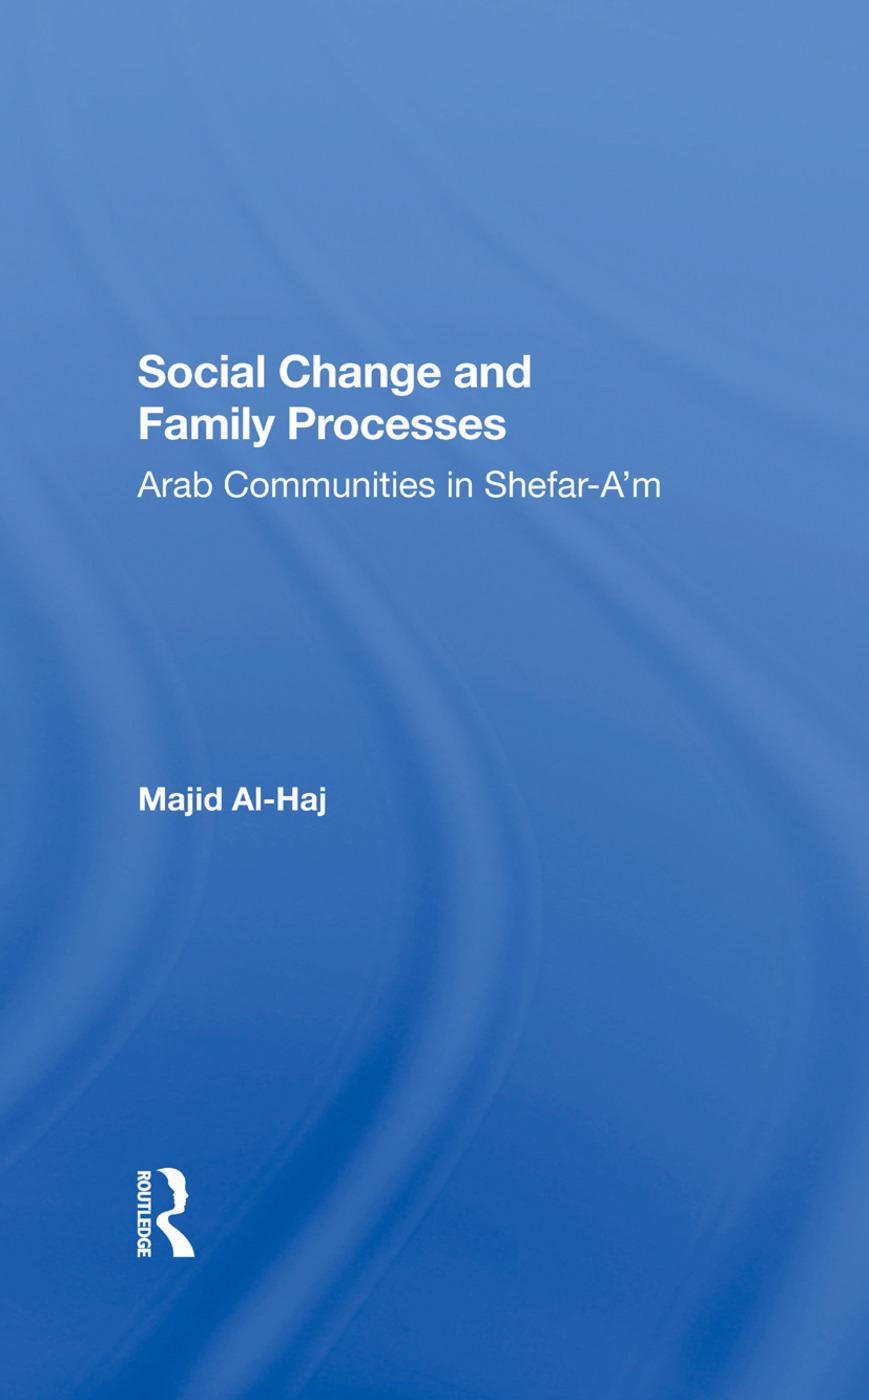 Social Change And Family Processes: Arab Communities In Shefara'm, 1st Edition (Hardback) book cover